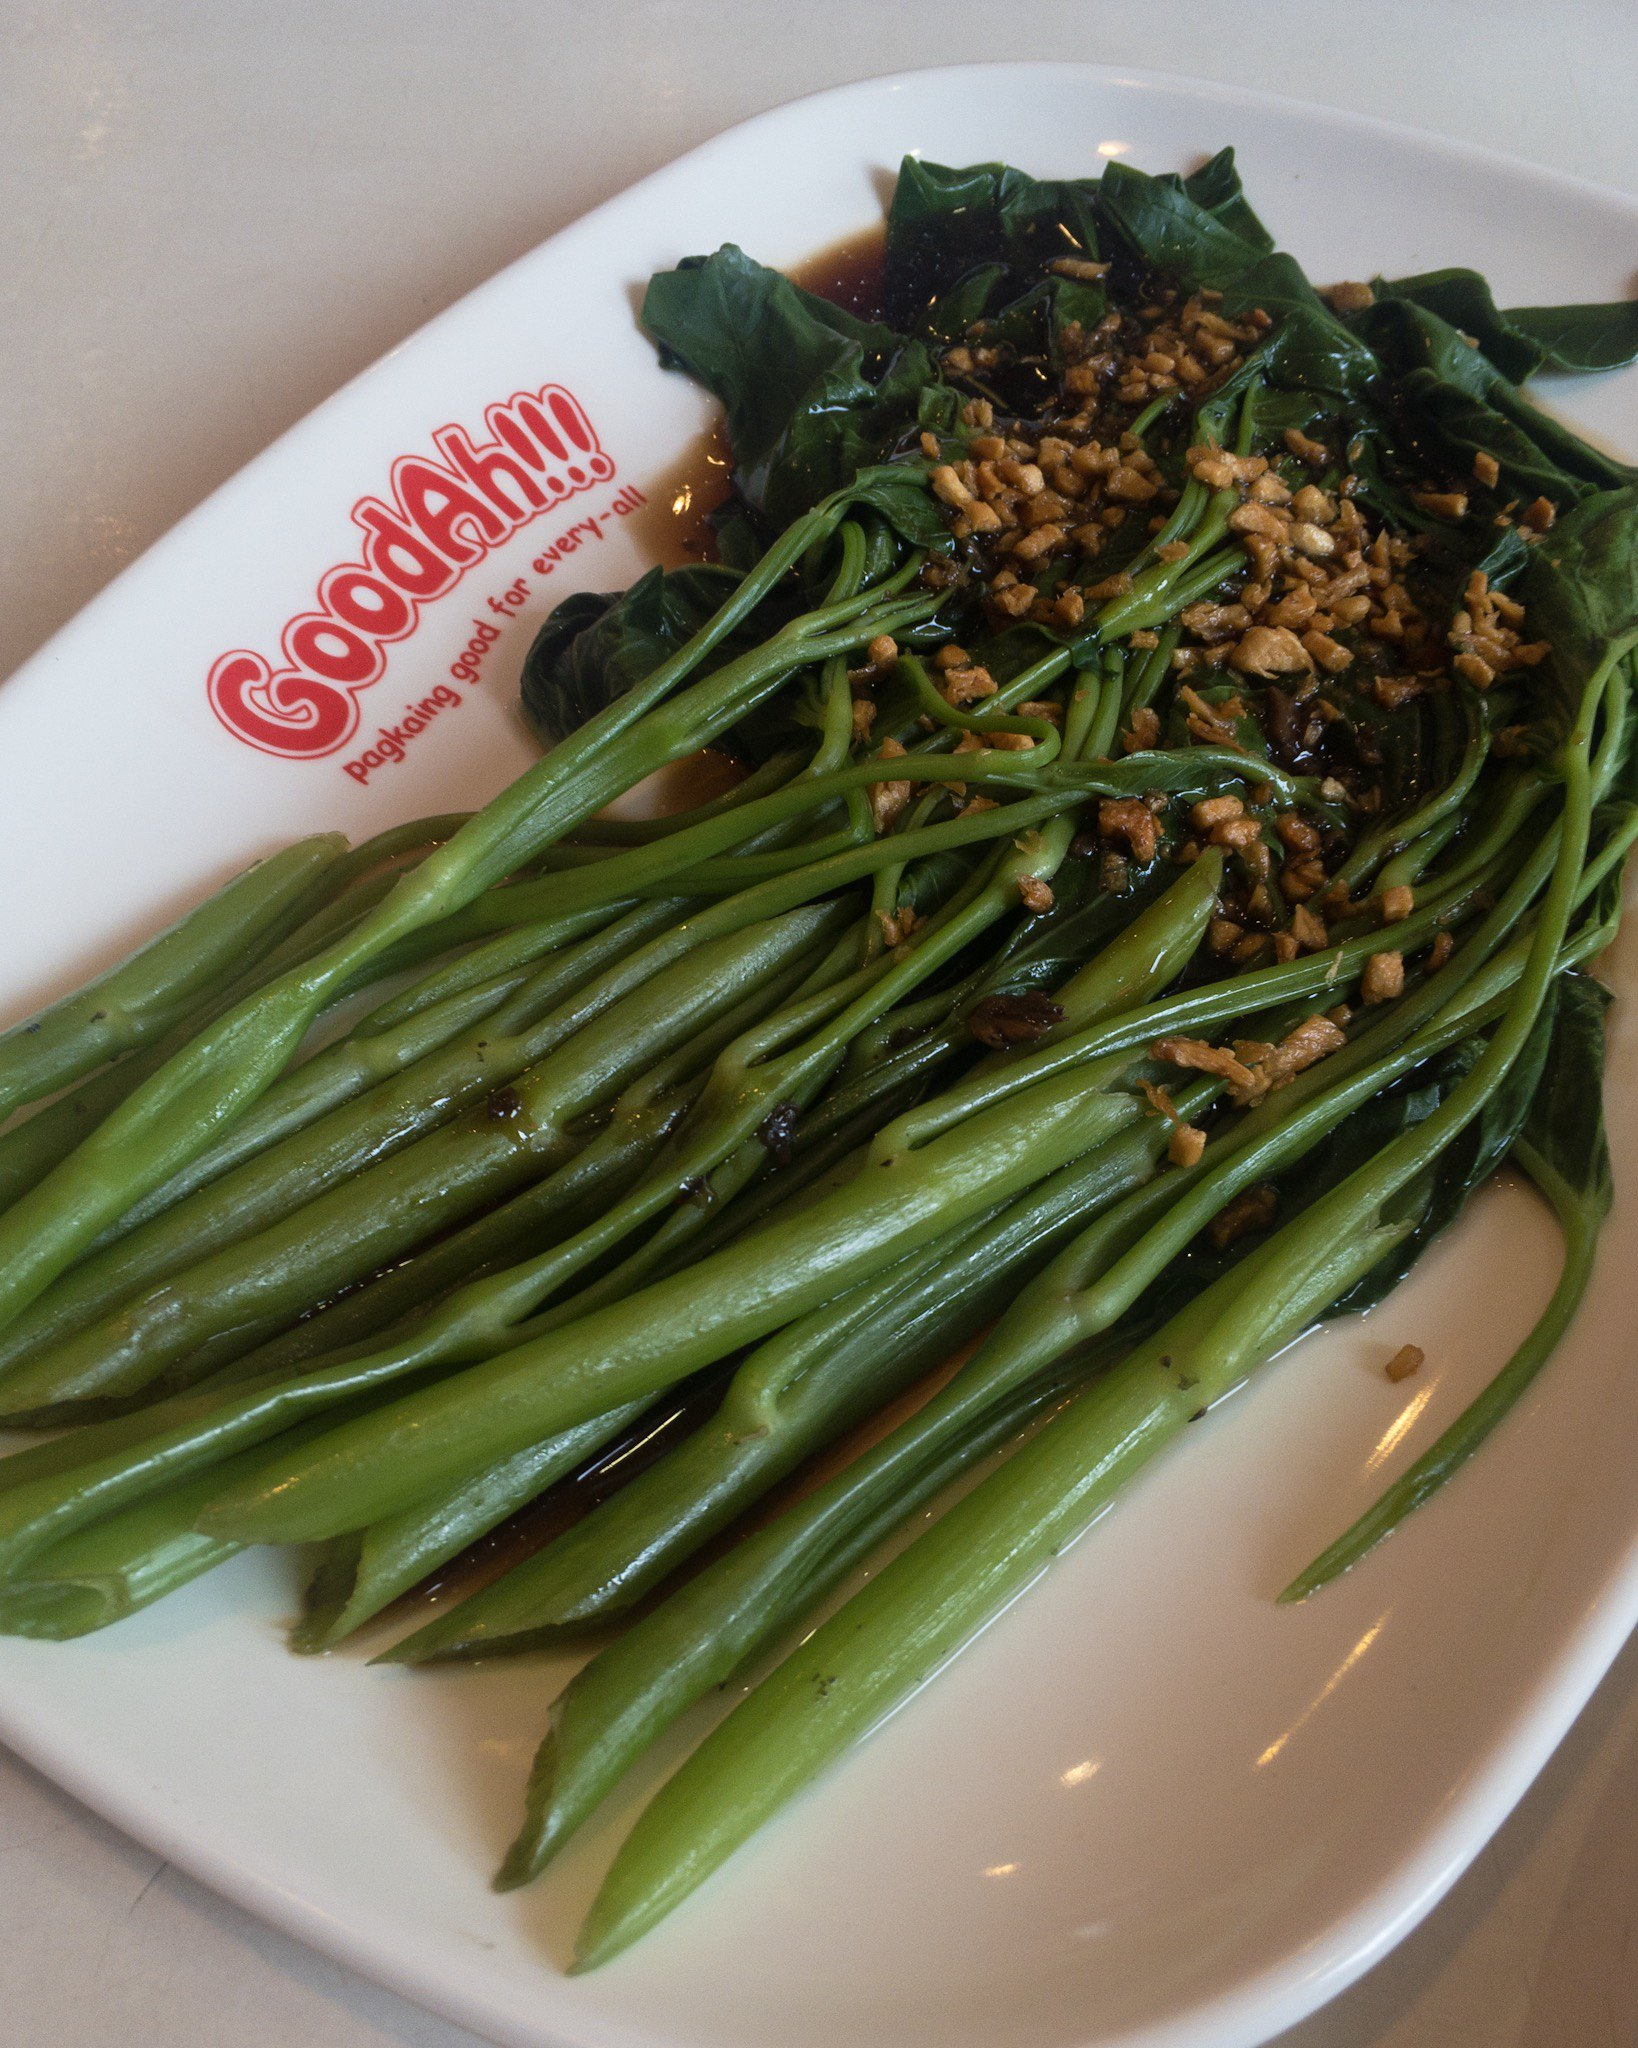 Garlic Kangkong - GoodAh!!! Market Market Review